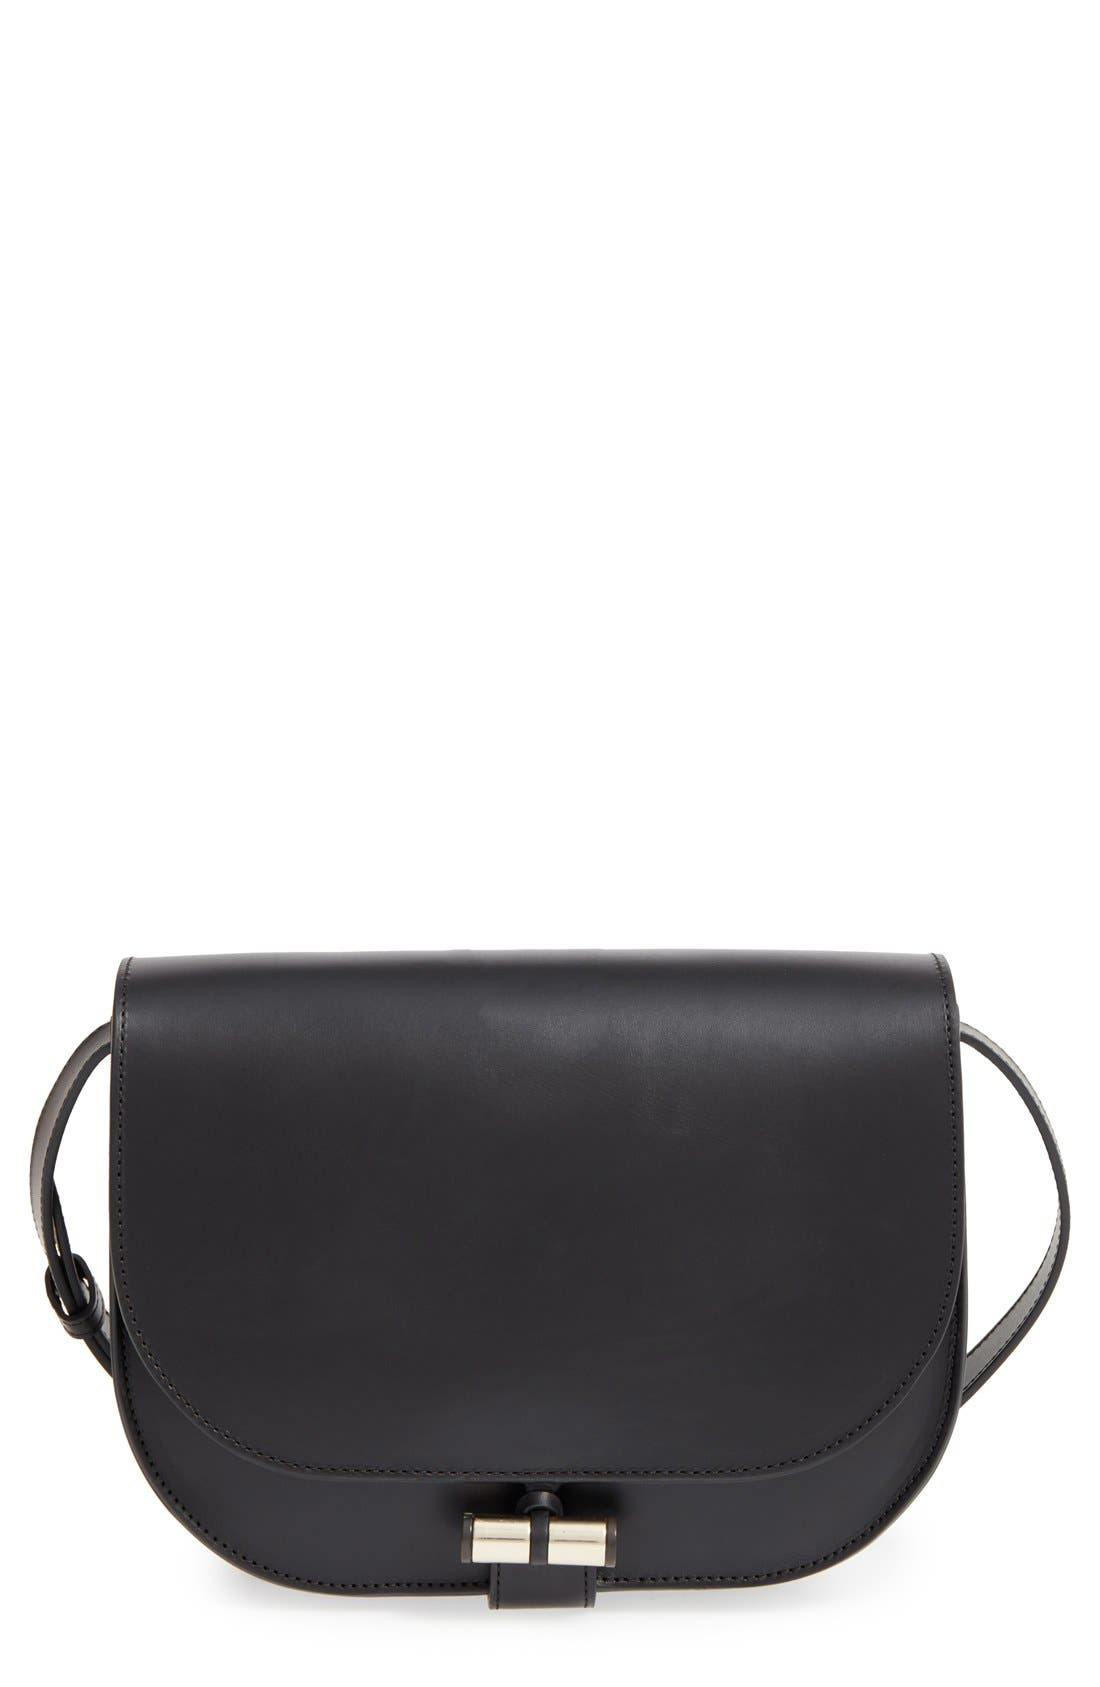 A.P.C. 'Sac June' Leather Shoulder Bag